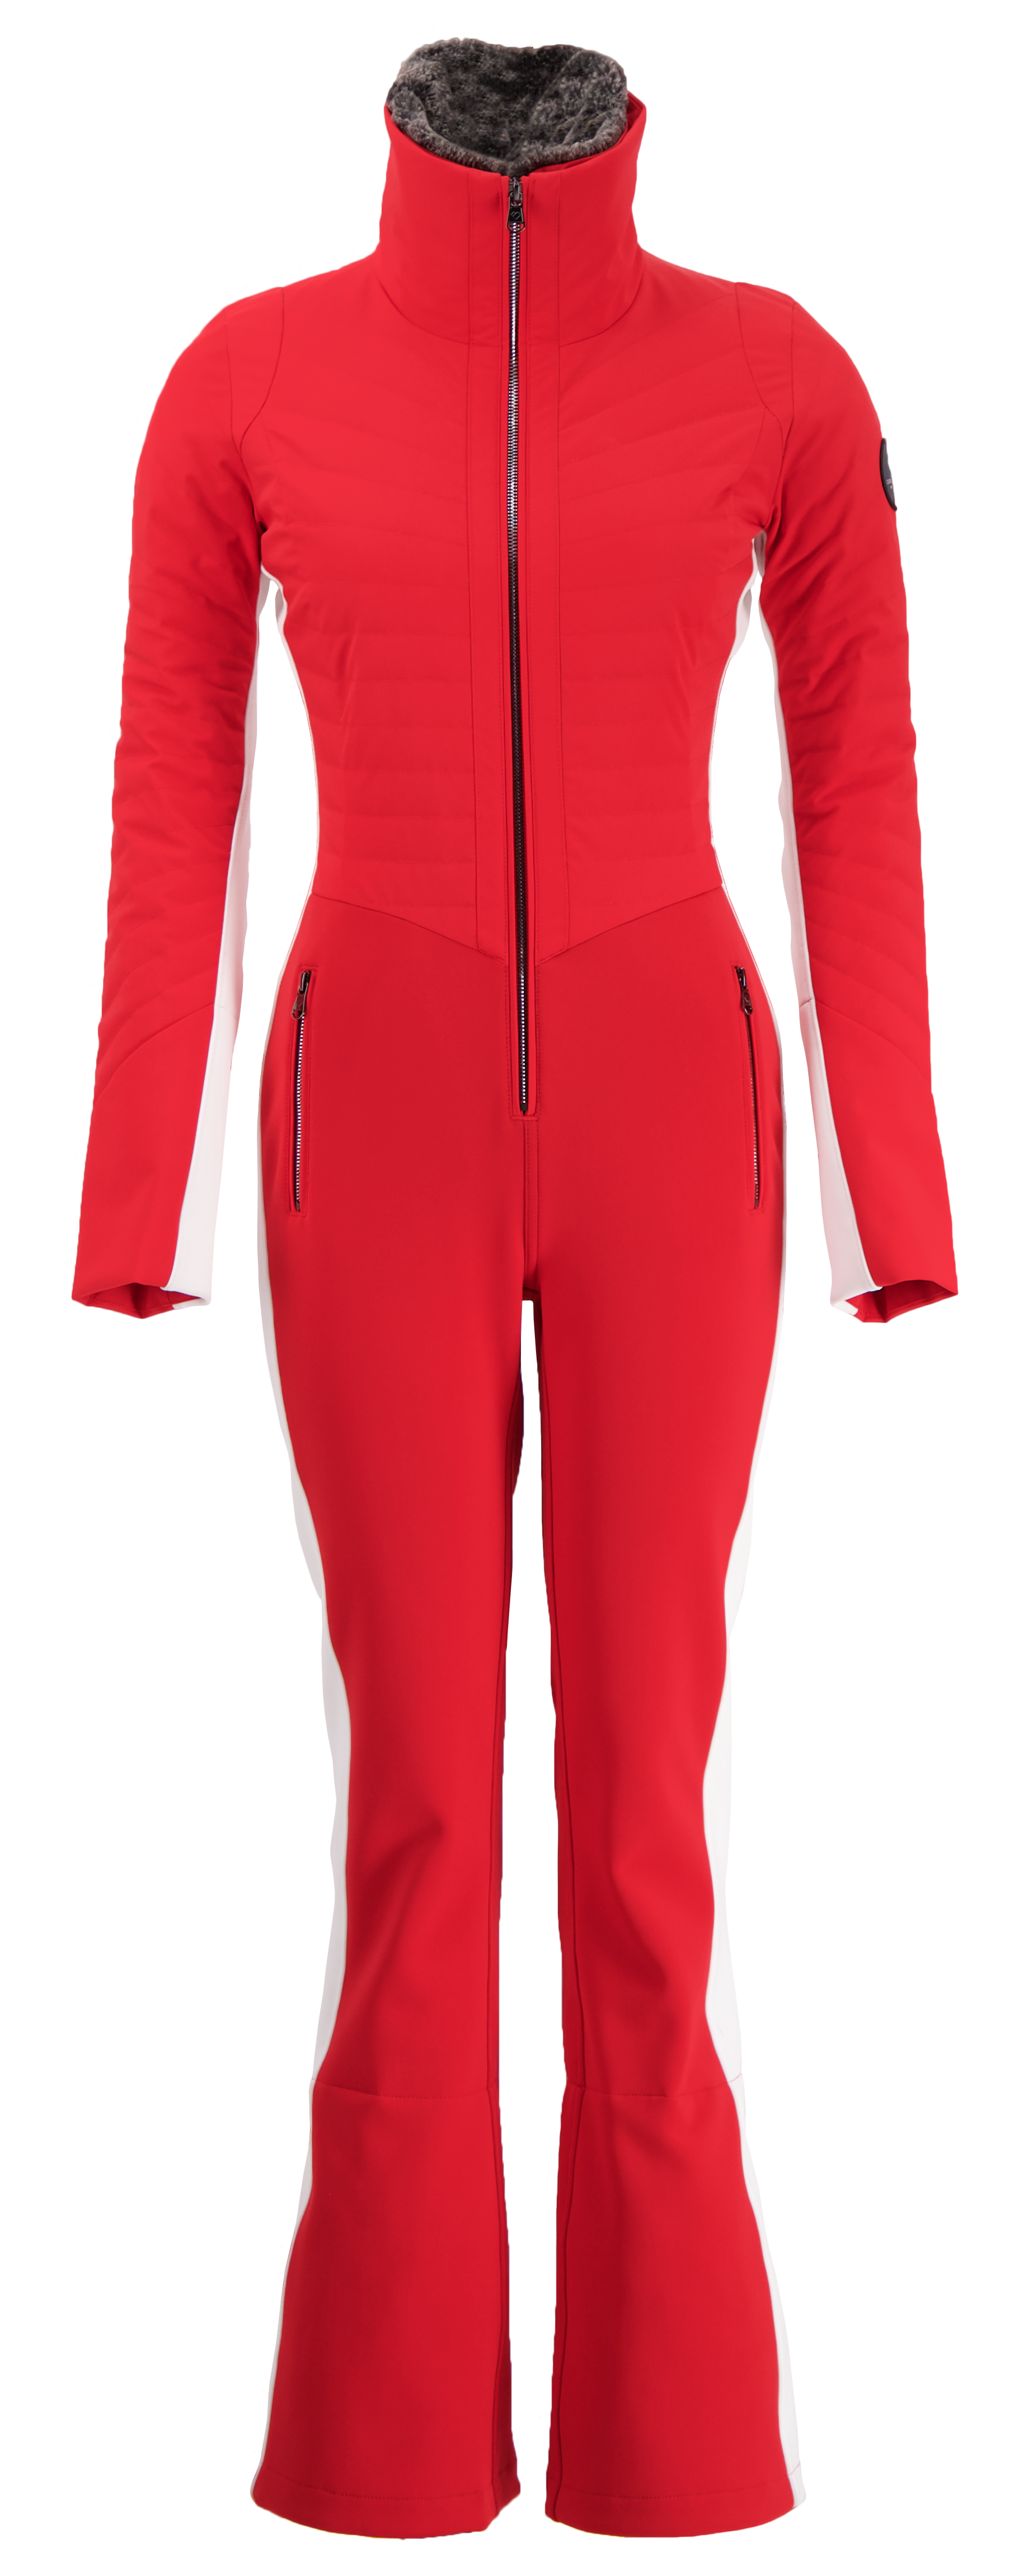 Spyder Core Outbound Half-Zip Mens Sweater